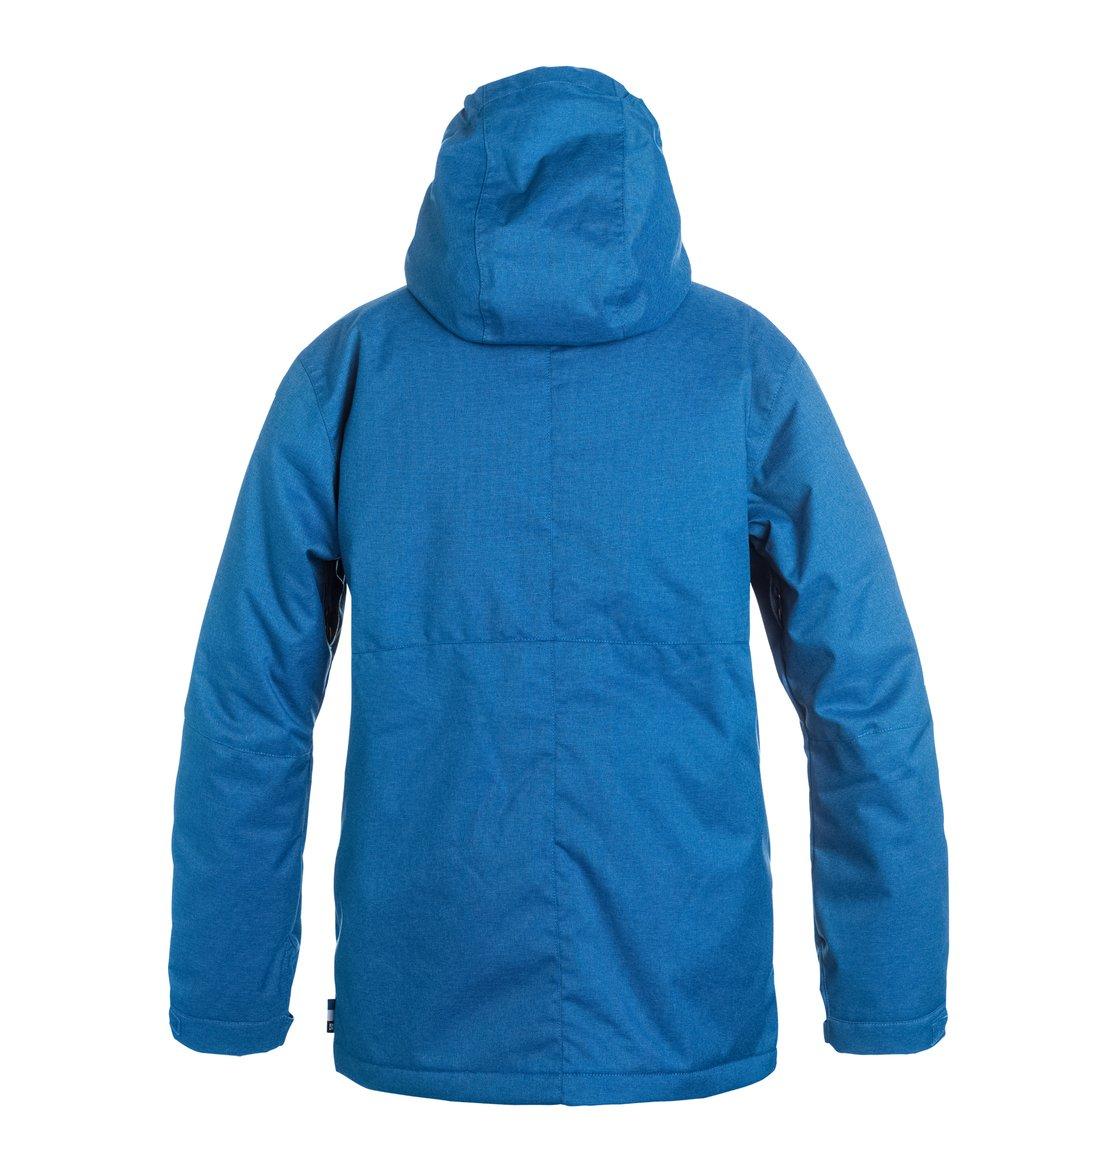 c13a61b7c 1 Boy's 8-16 Servo Snow Jacket EDBTJ03014 DC Shoes